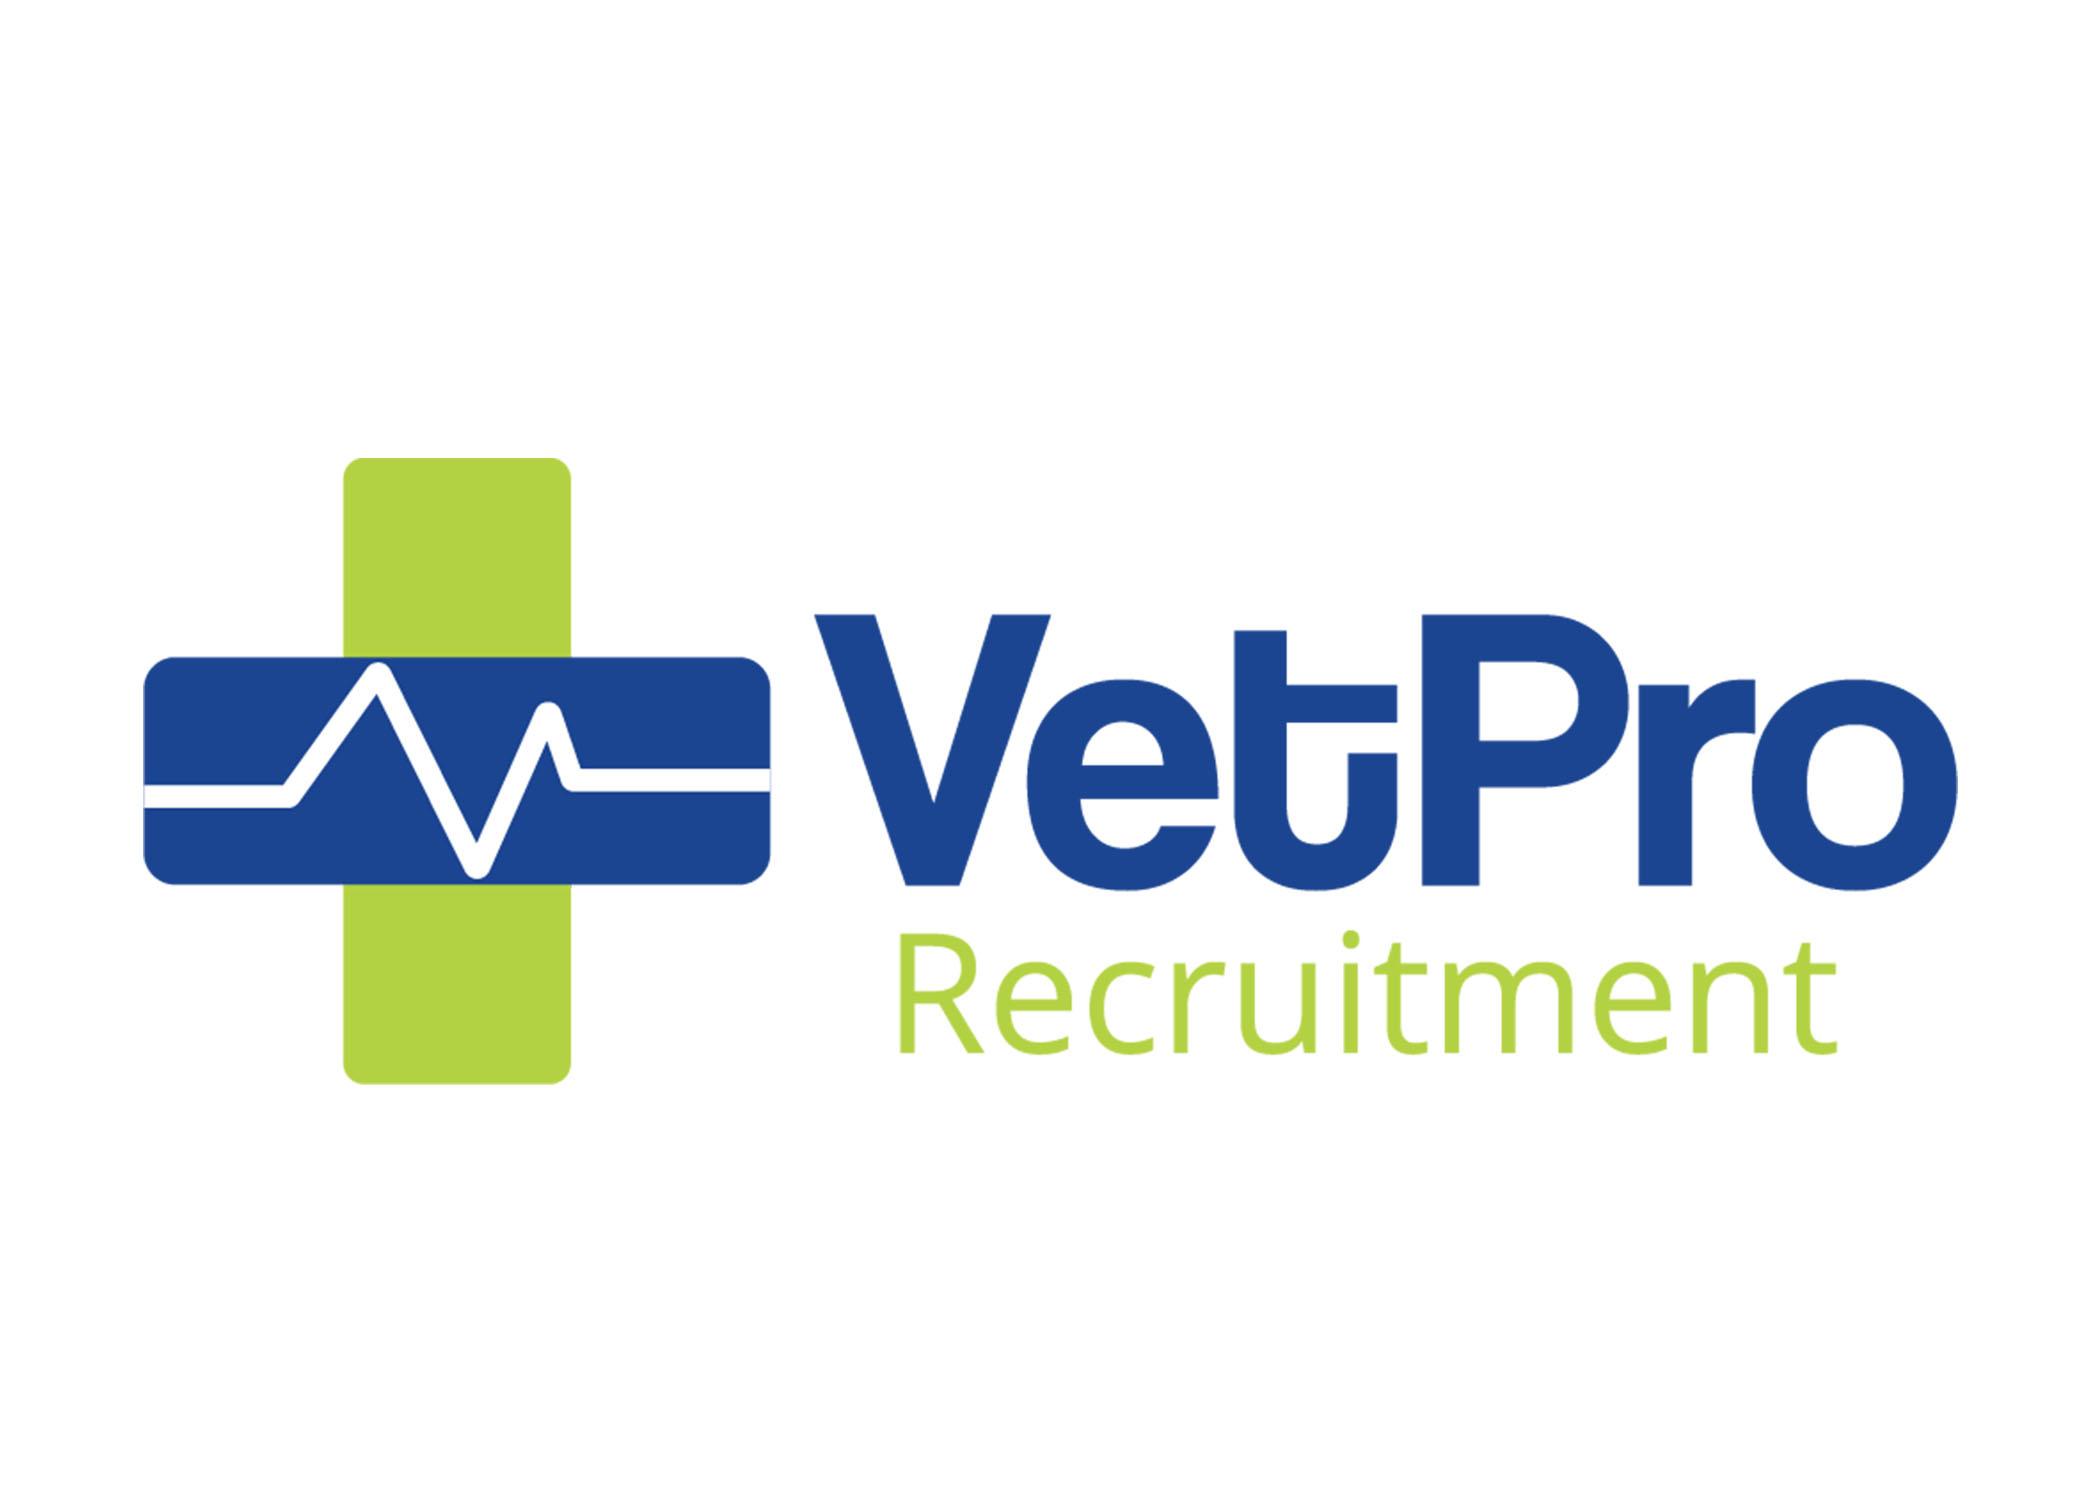 VetPro Recruitment